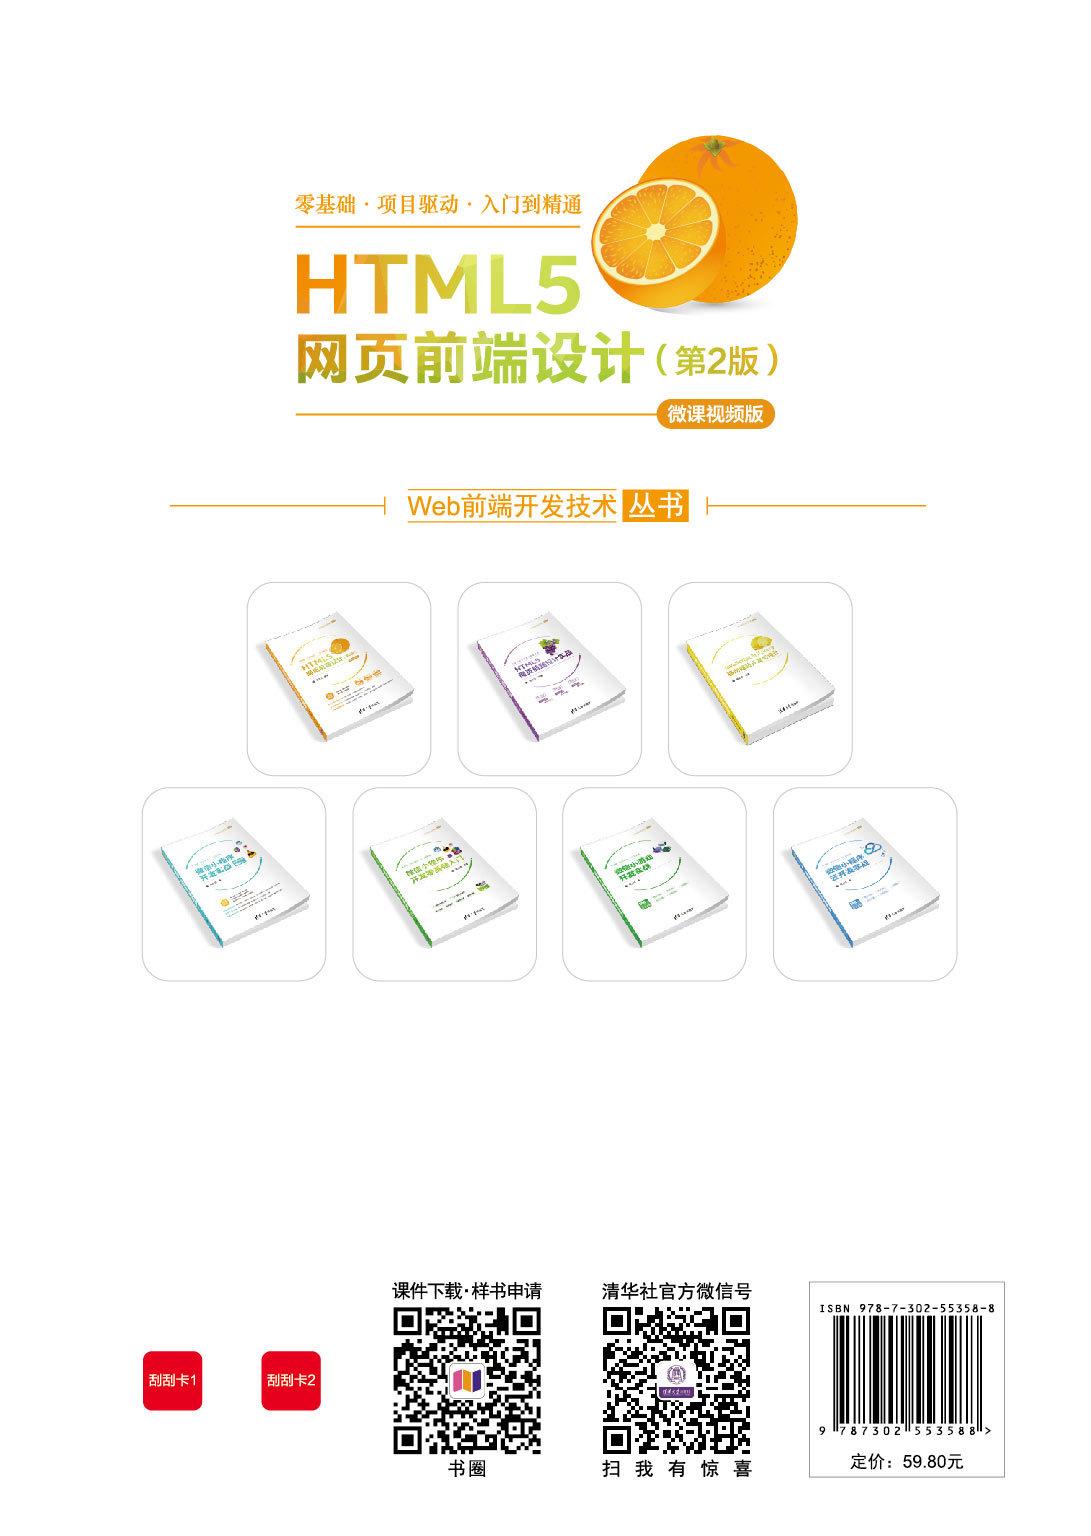 HTML5網頁前端設計(第2版)-微課視頻版-preview-2